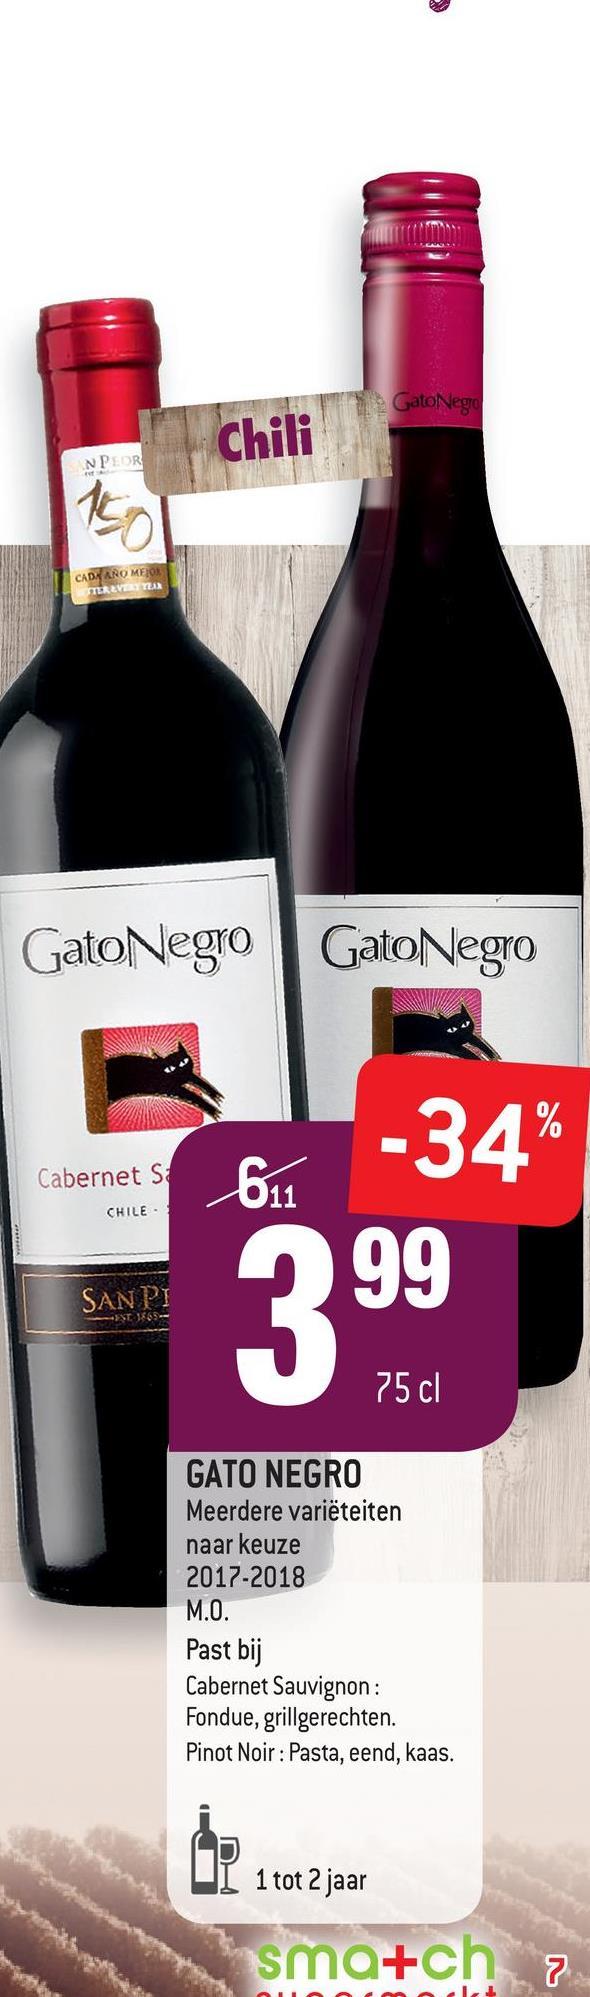 Gato Nego Chili PEOR CADA ANO ME TERVER GatoNegro GatoNegro -34% Cabernet Sa 611 CHILE 99 SANPI 75 cl GATO NEGRO Meerdere variëteiten naar keuze 2017-2018 M.O. Past bij Cabernet Sauvignon : Fondue, grillgerechten. Pinot Noir: Pasta, eend, kaas. 1 tot 2 jaar sma+ch 7